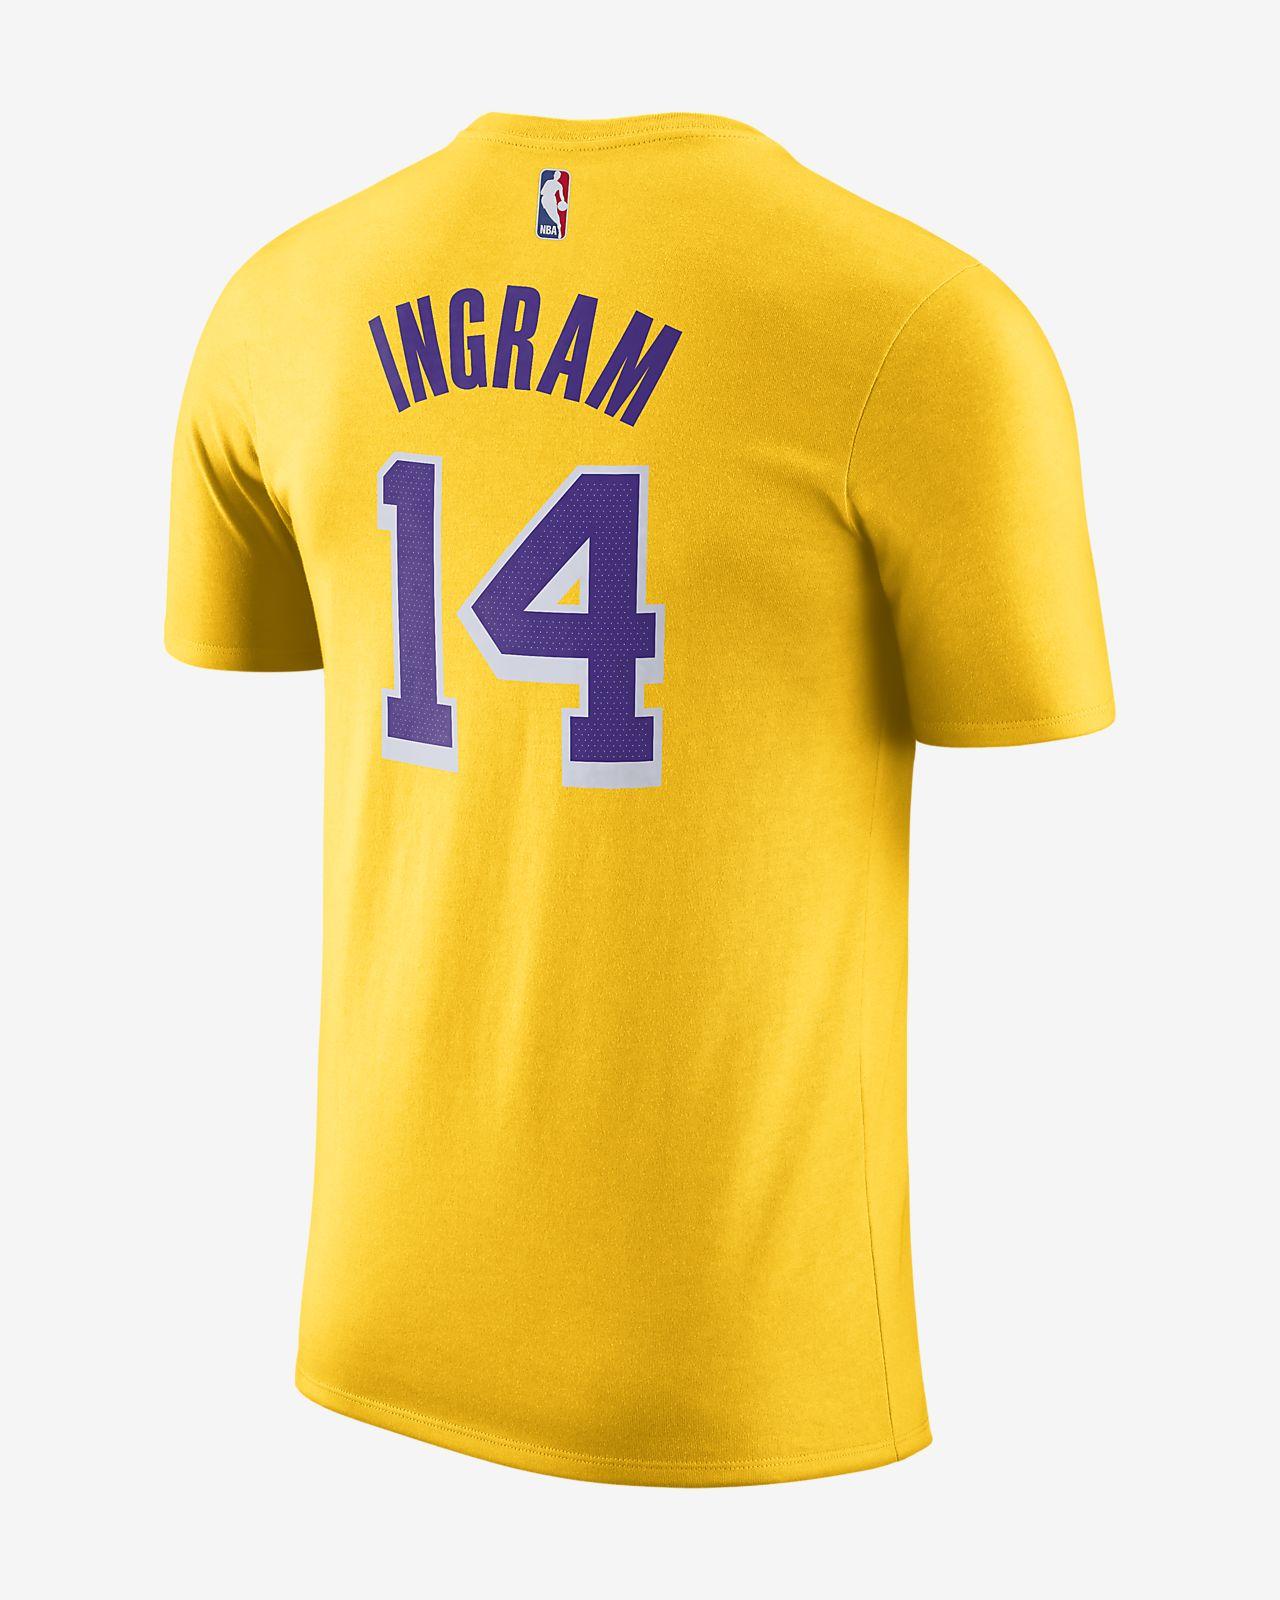 8b22ac73625 Brandon Ingram Los Angeles Lakers Nike Dri-FIT Men s NBA T-Shirt ...